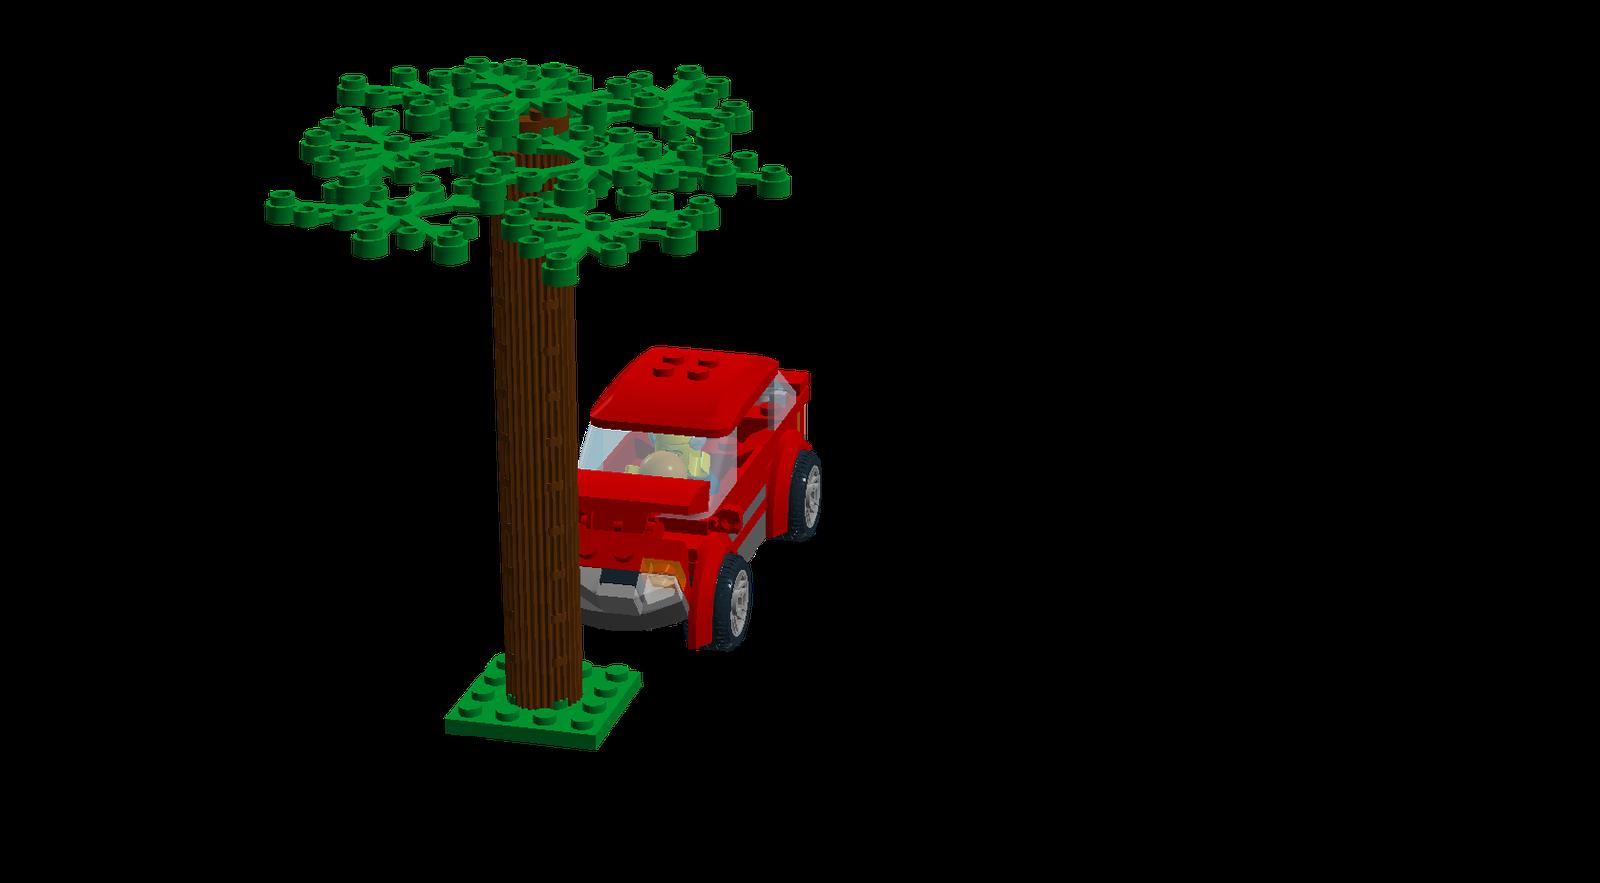 Tree car crash clipart banner black and white stock LEGO Ideas - Product Ideas - Car Crash! banner black and white stock